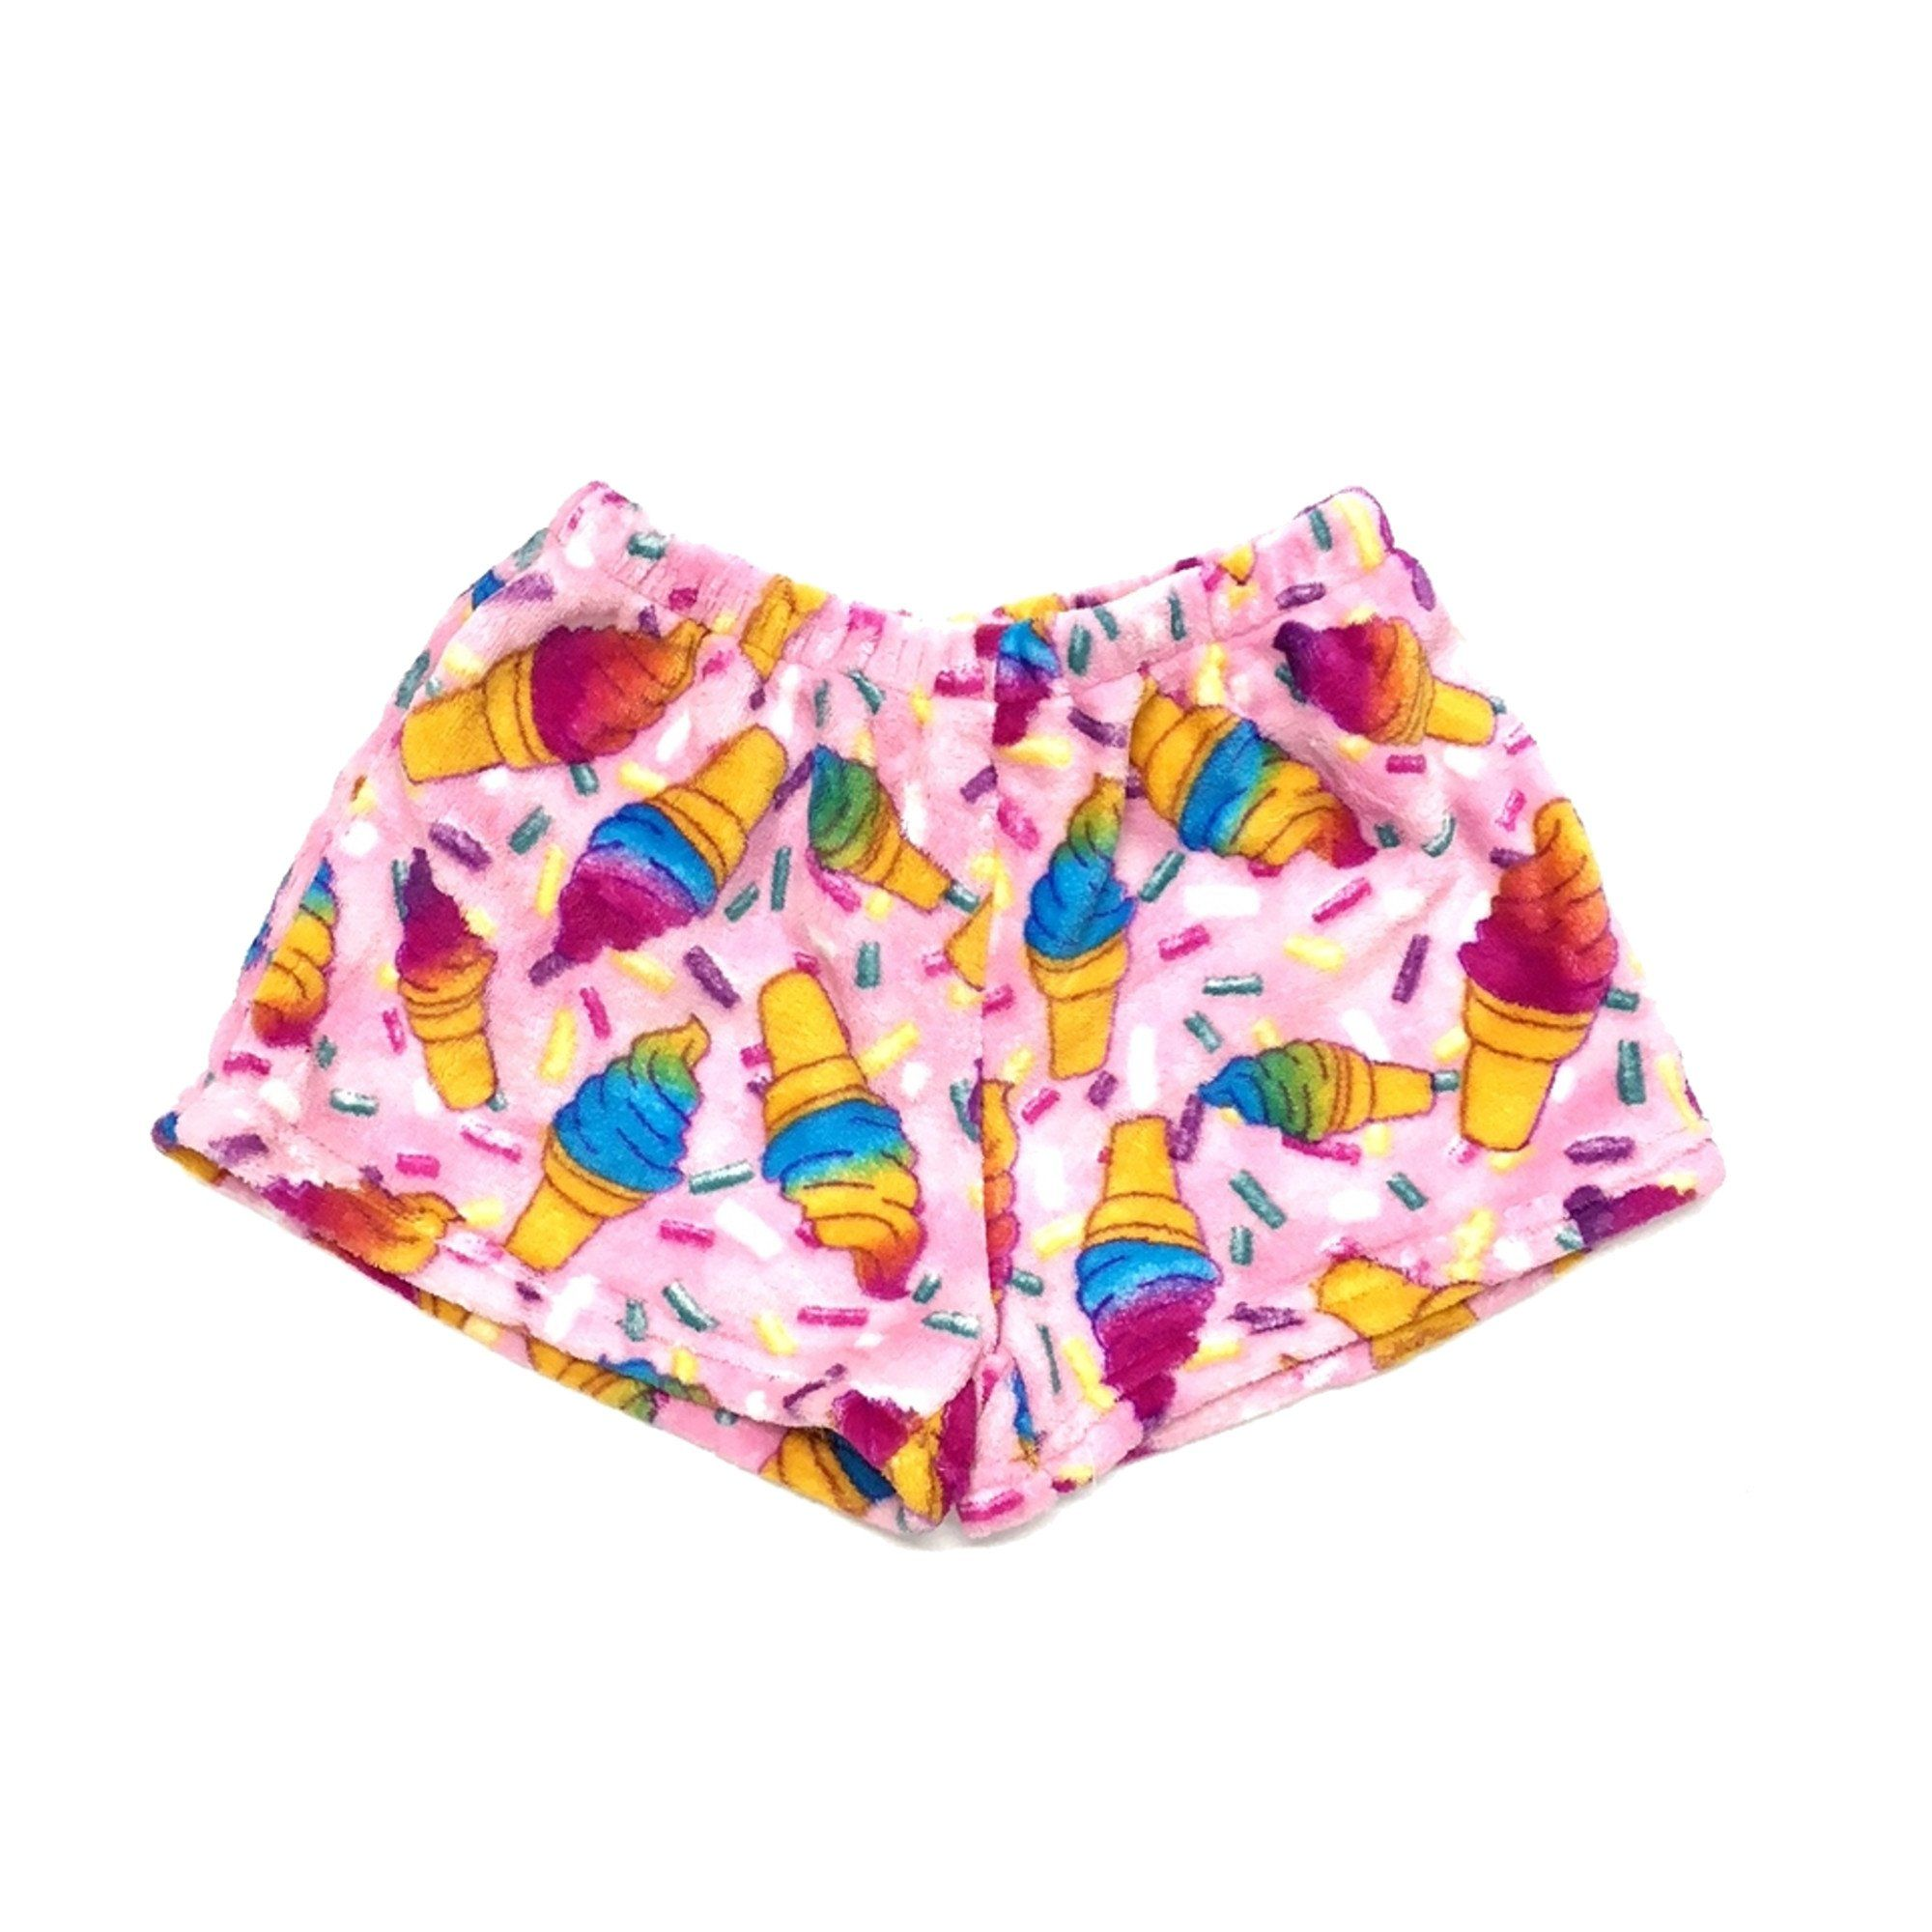 Colette Lilly Girls Make a Splash 4-Piece Shorts Set Outfit